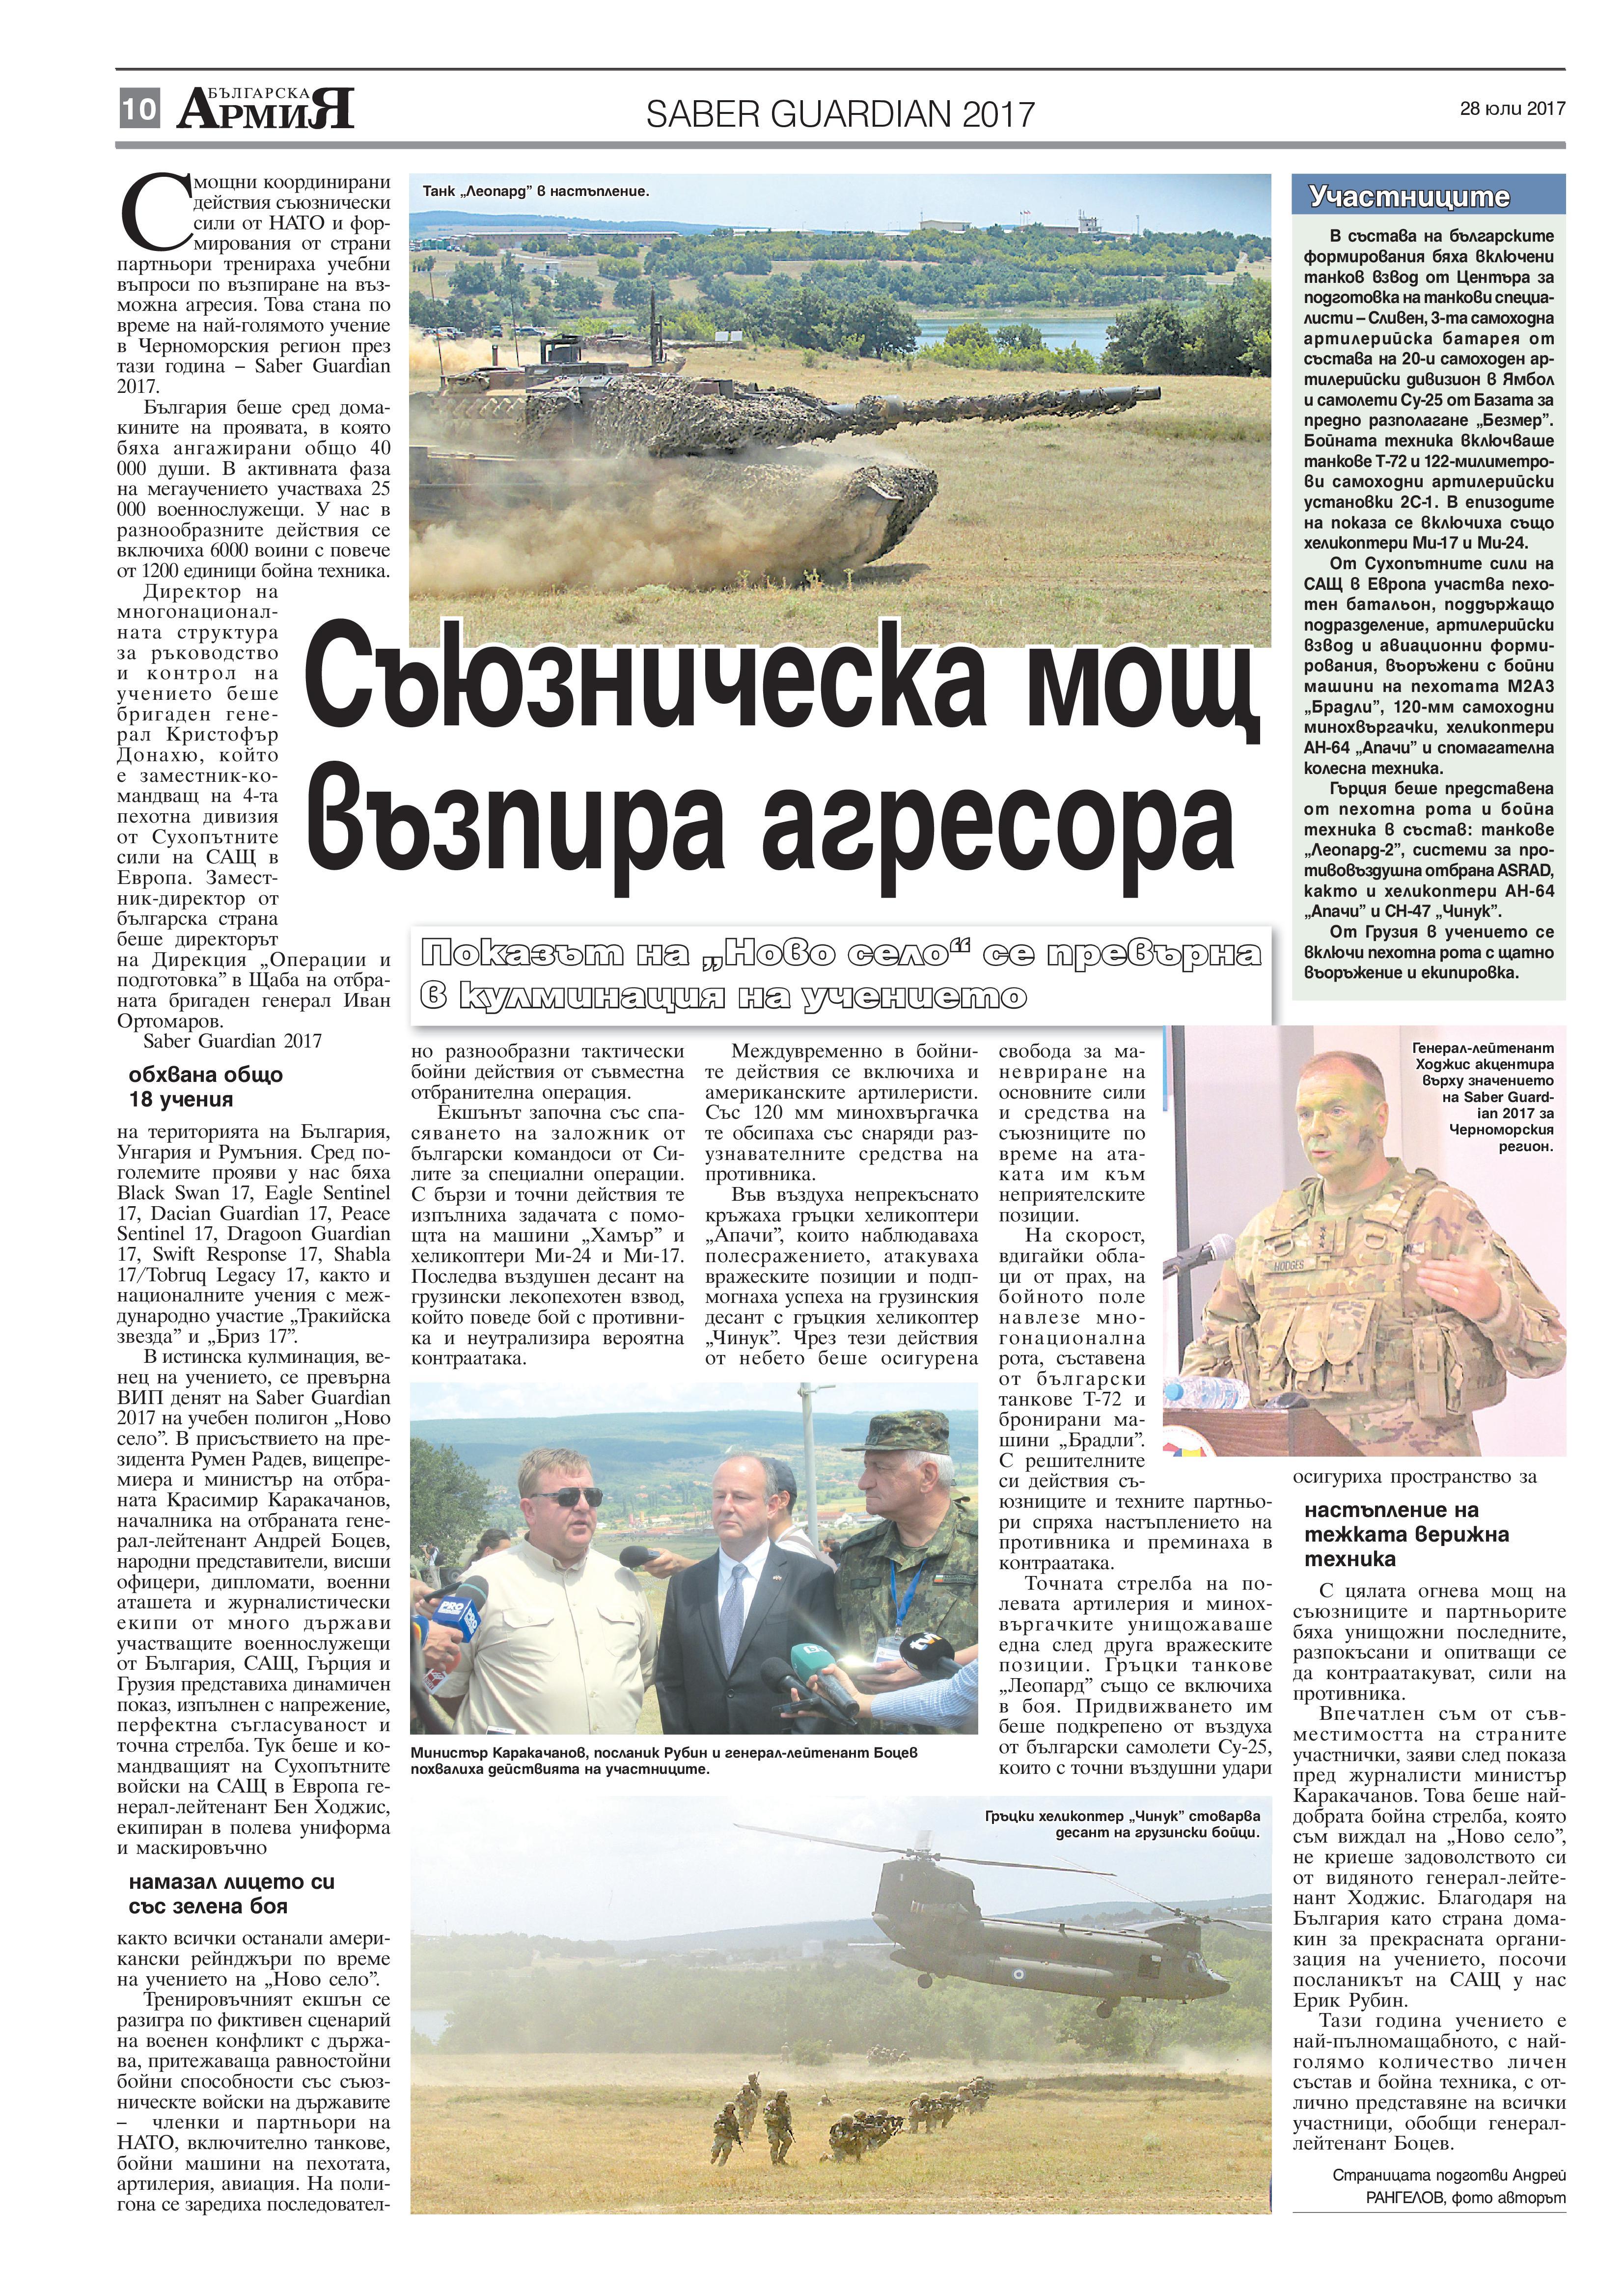 https://www.armymedia.bg/wp-content/uploads/2015/06/10-7.jpg